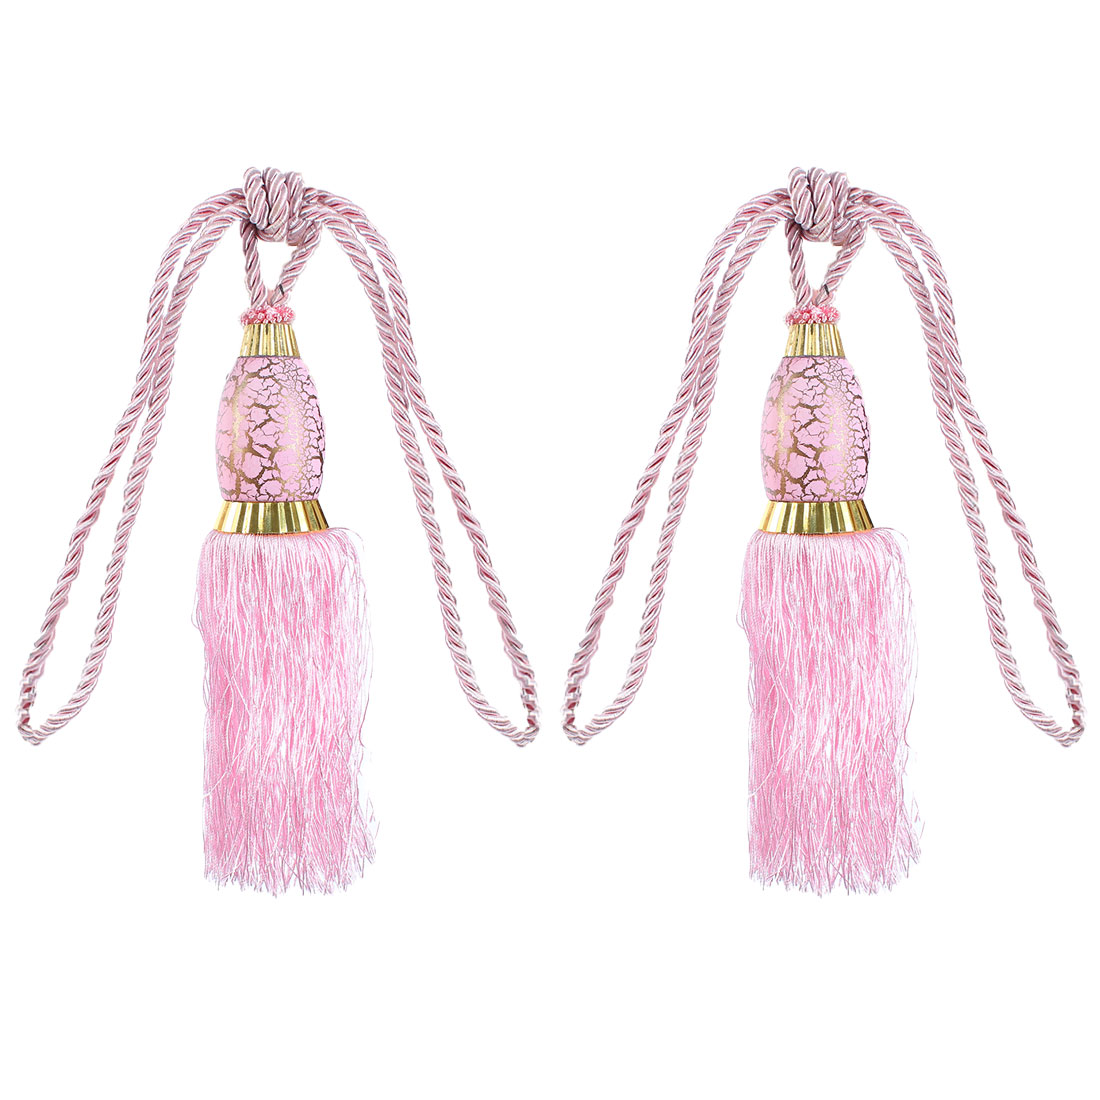 2Pcs Window Curtain Drapery Tassel Rope Tie Back Holdback Fringe Pink